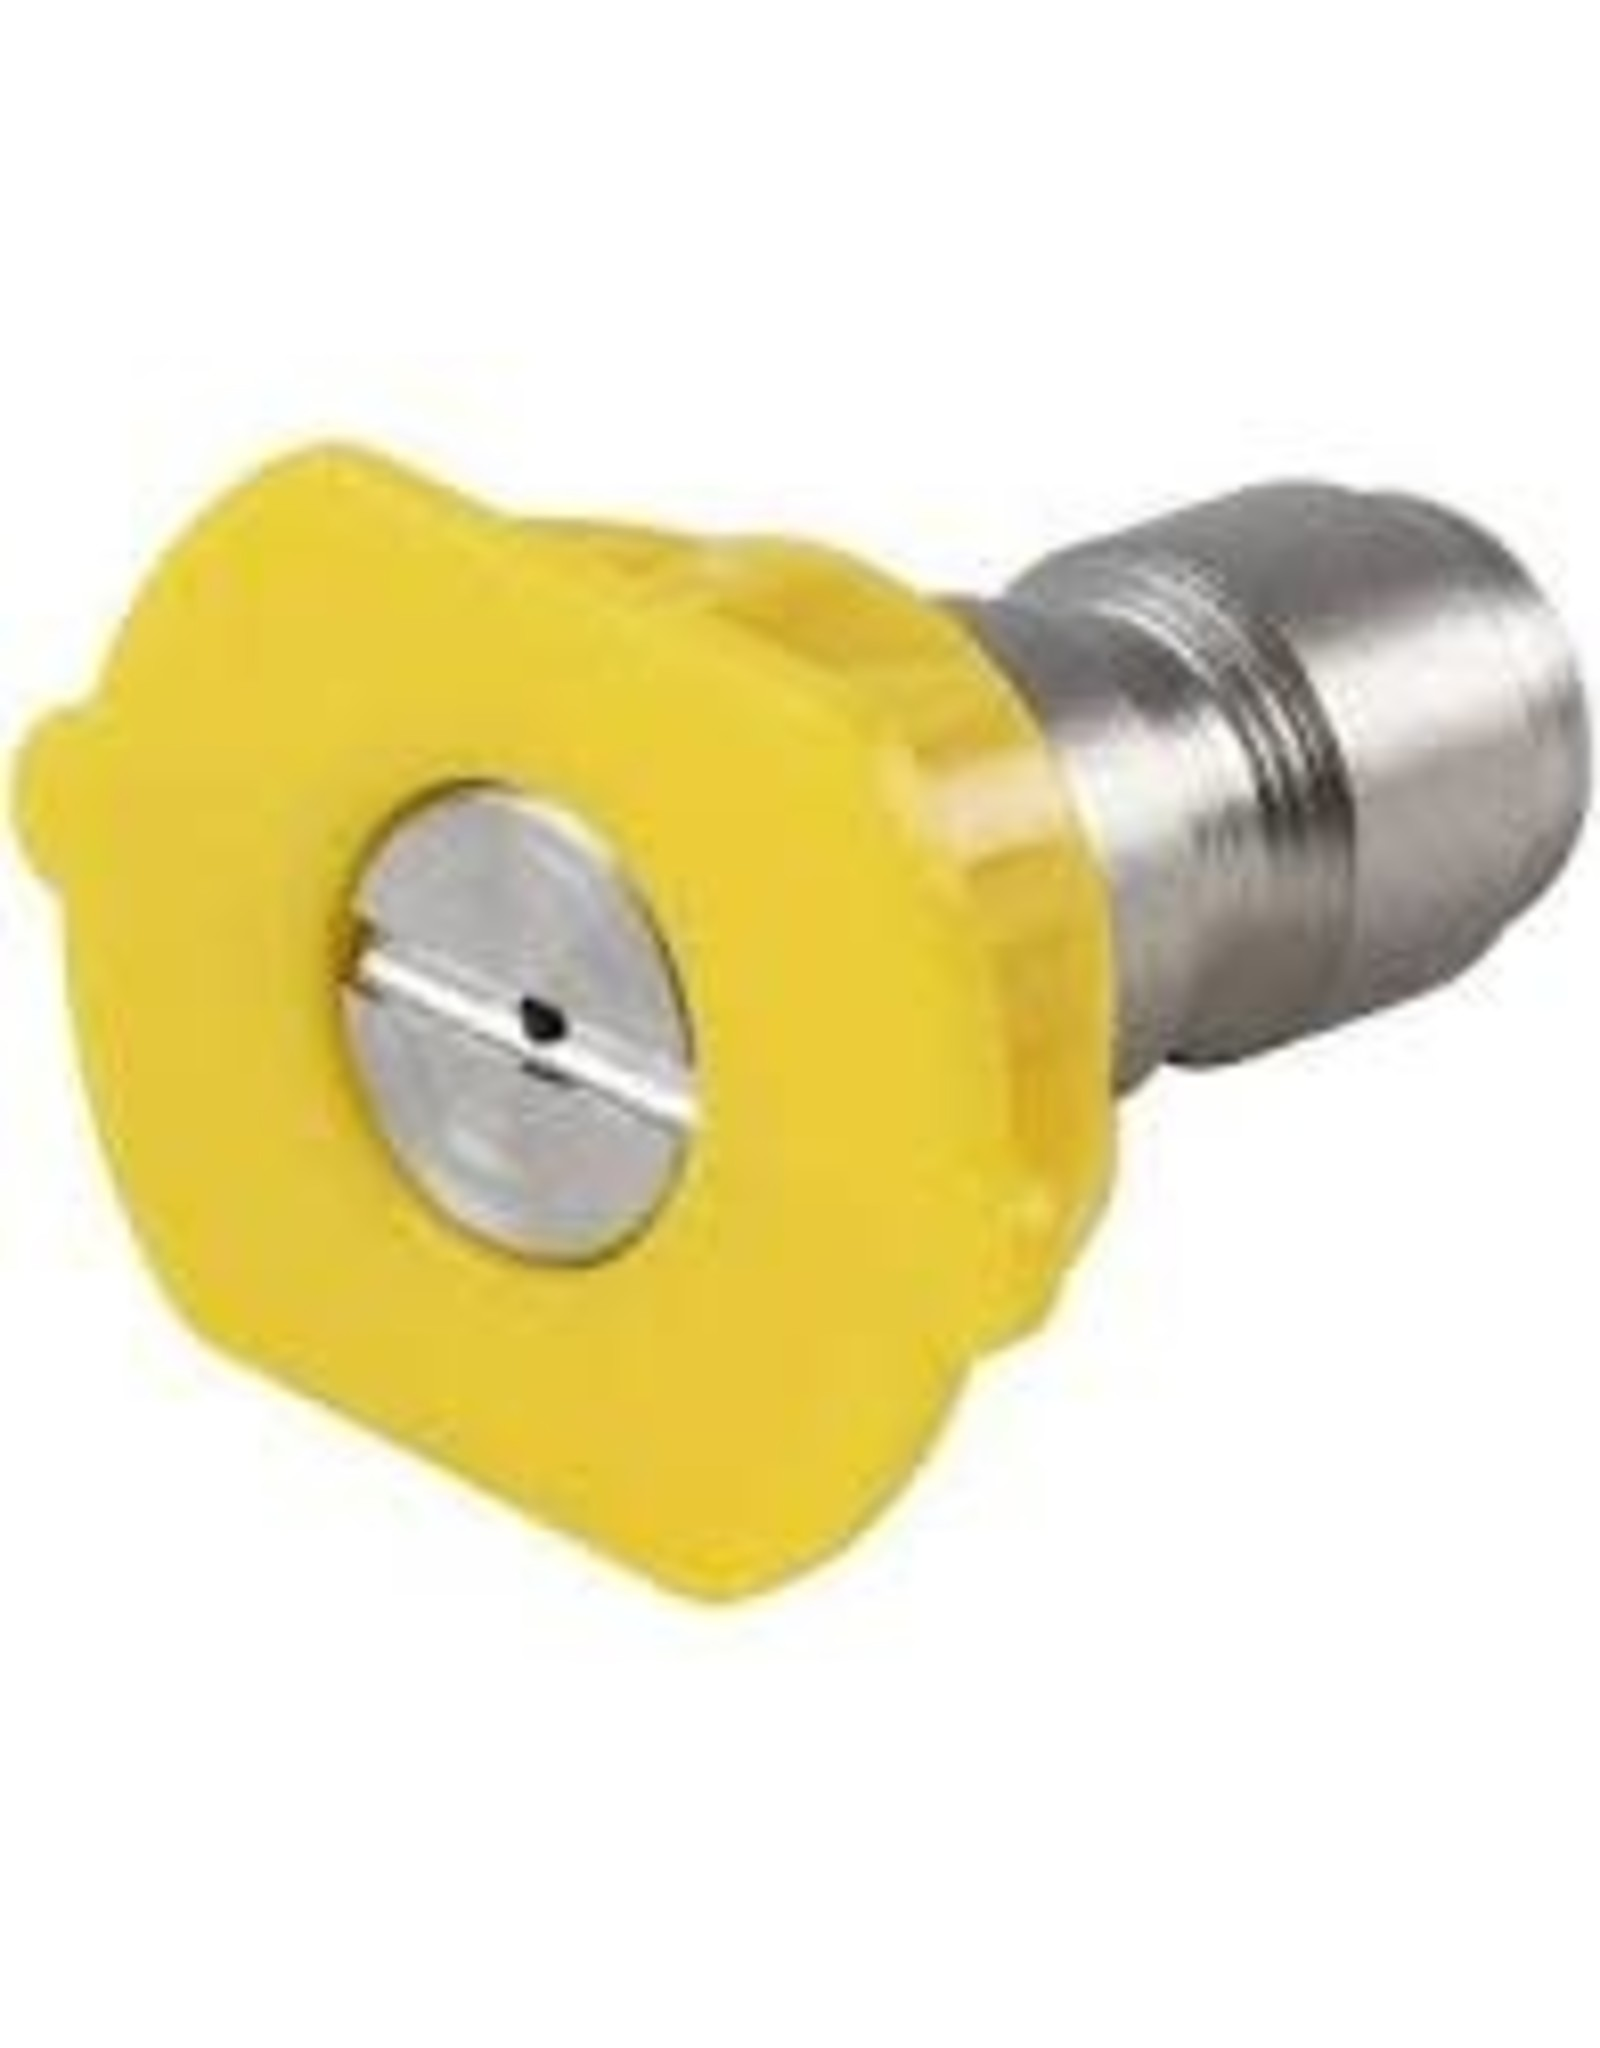 BE 85.216.030 Nozzle 15 deg QC